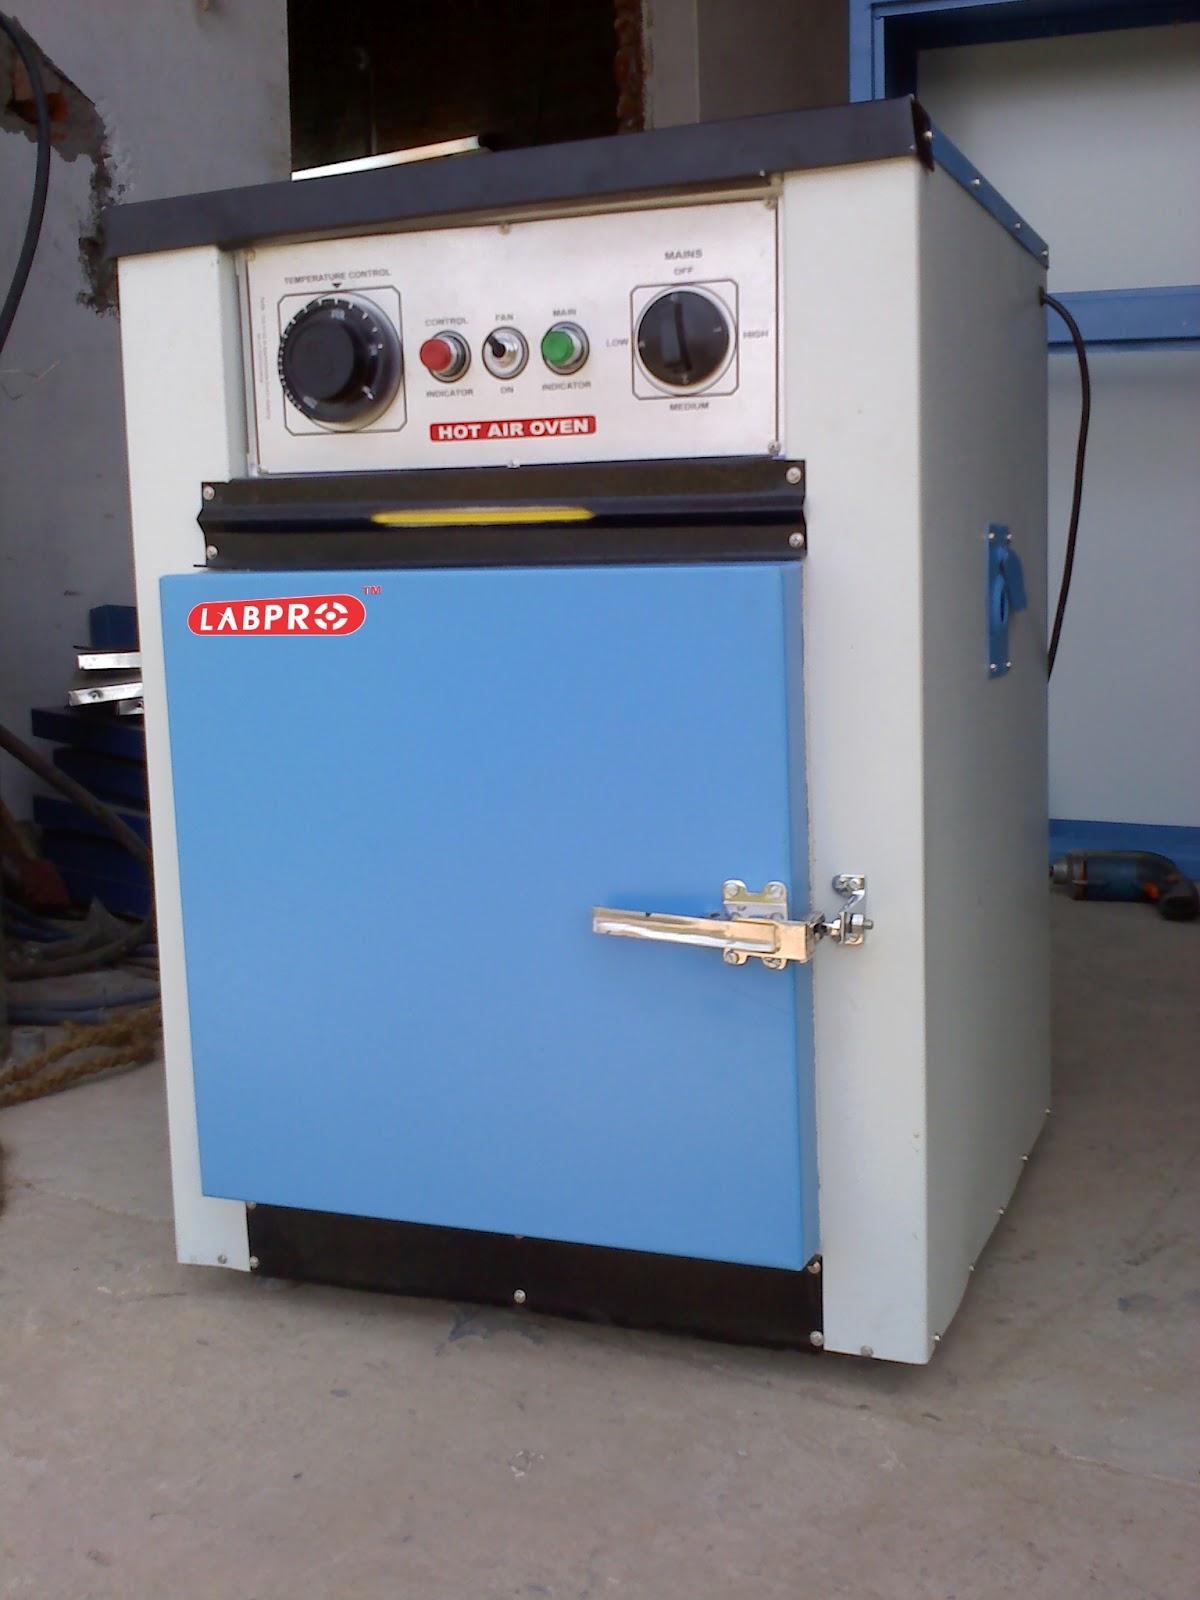 Hot Air Oven ~ Labpro hot air oven international